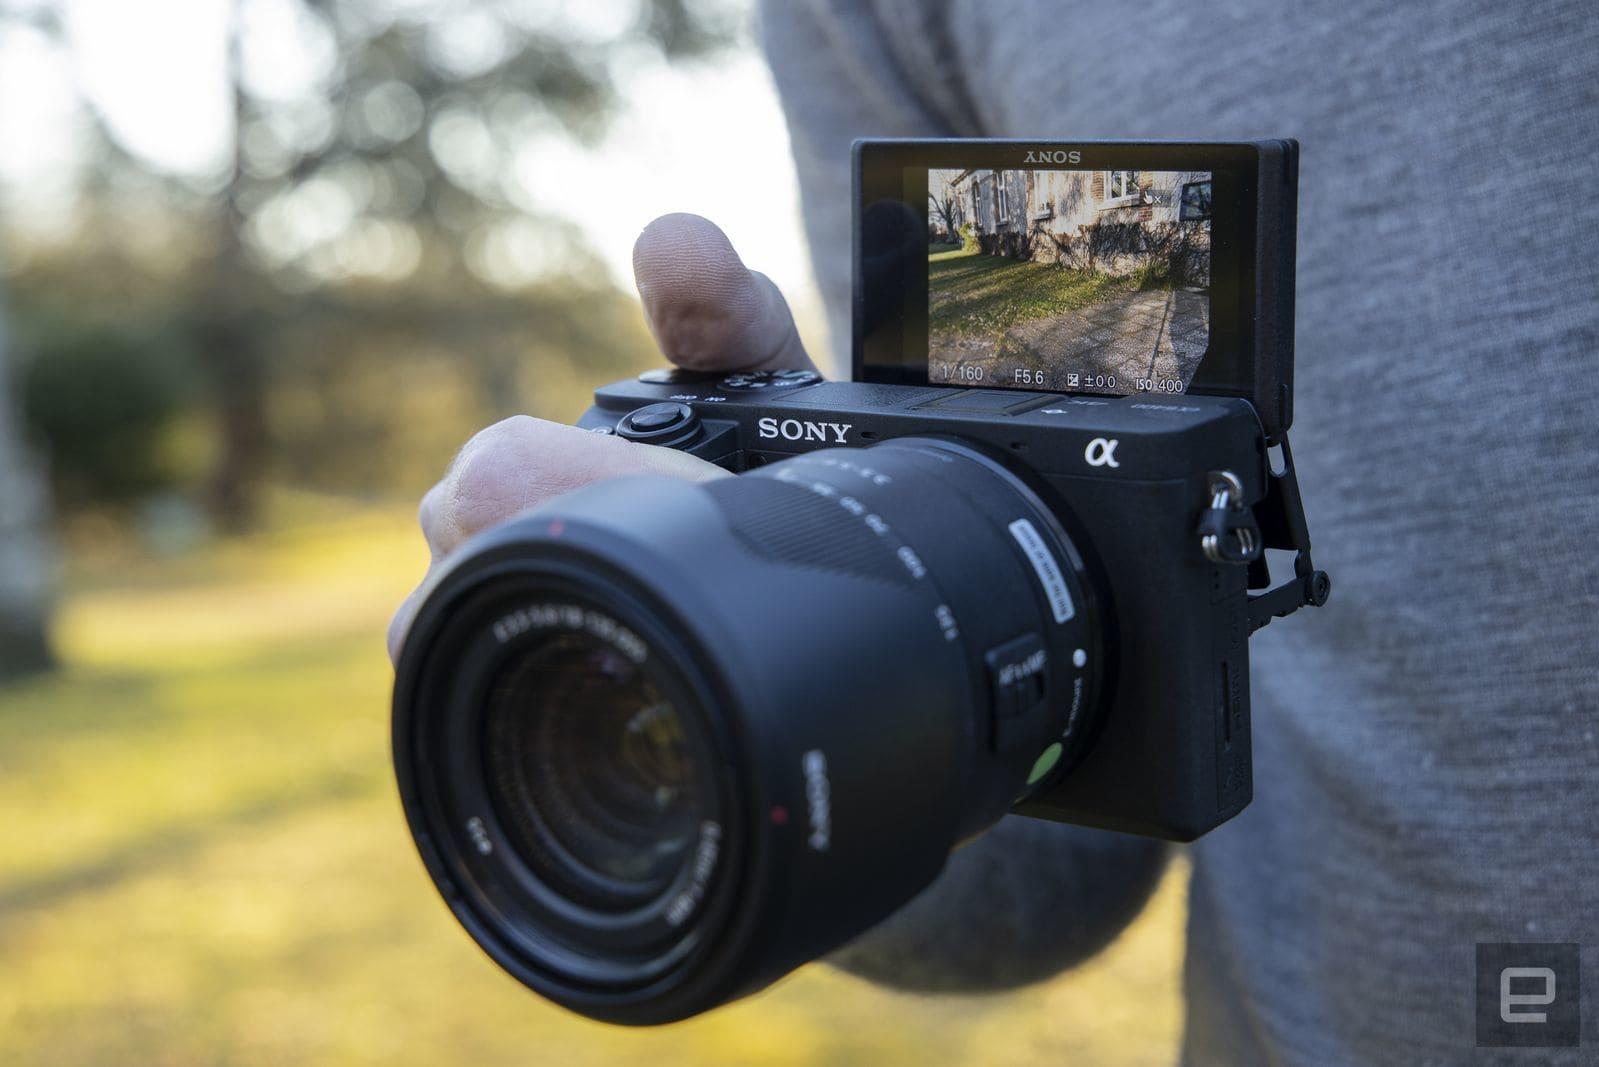 Sony A6400 APS-C mirrorless camera